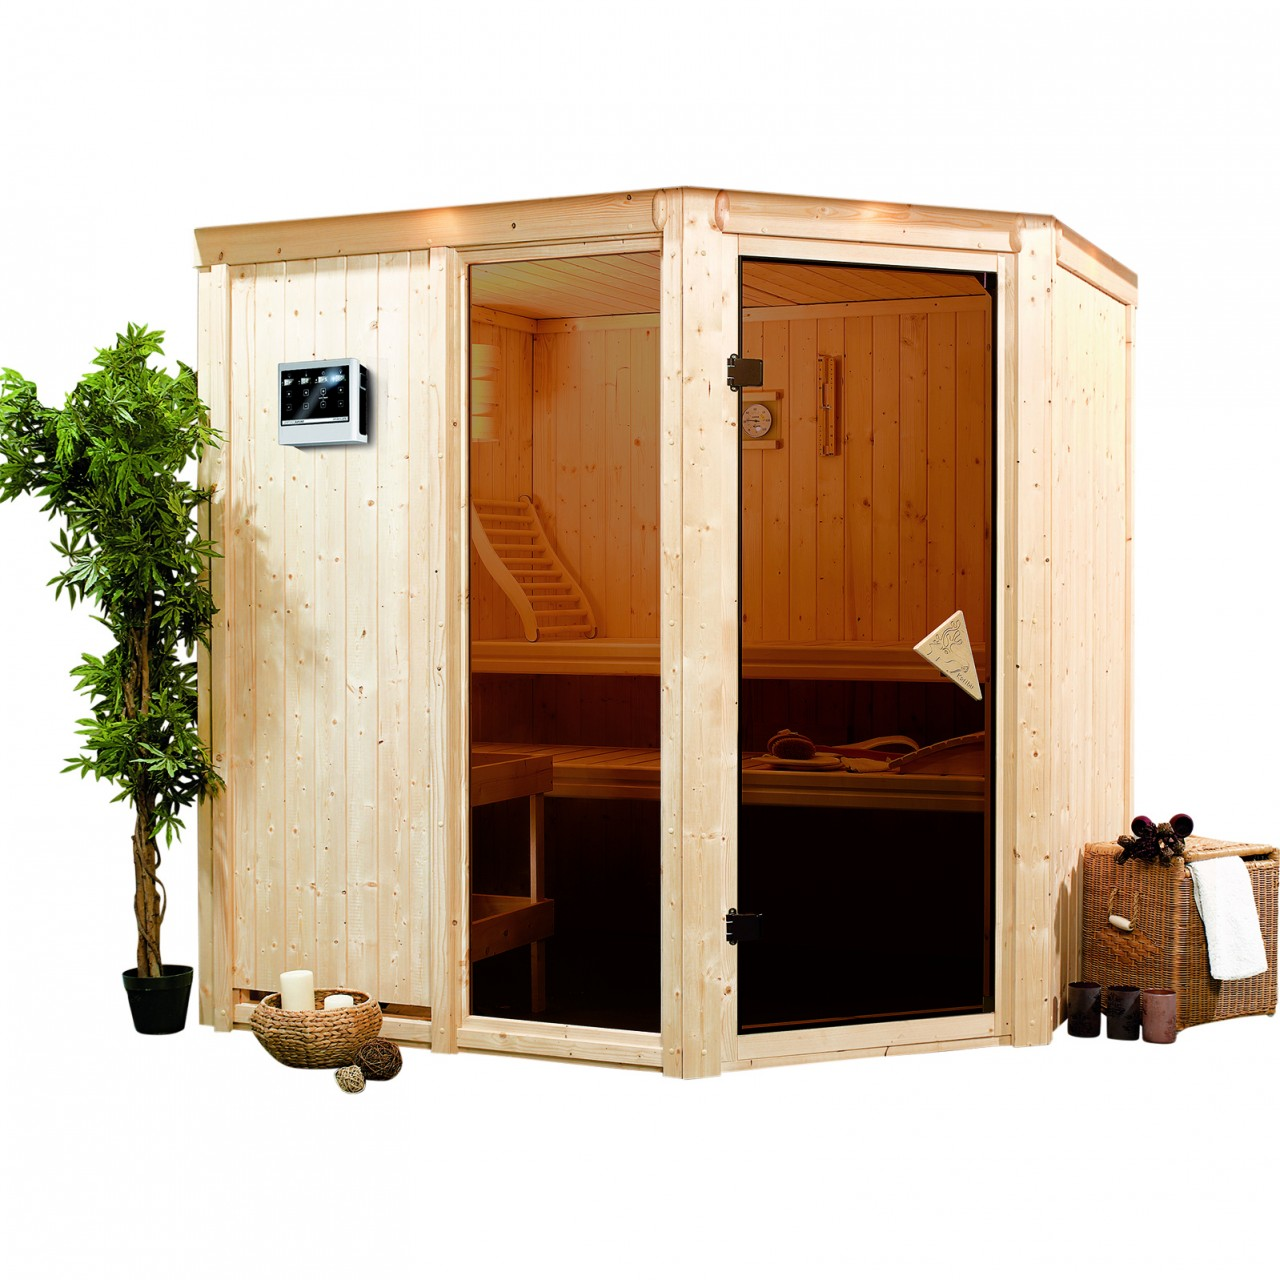 Sauna FIONA 1,96 x 1,70 m - 9.0 kW Ofen ext. St...